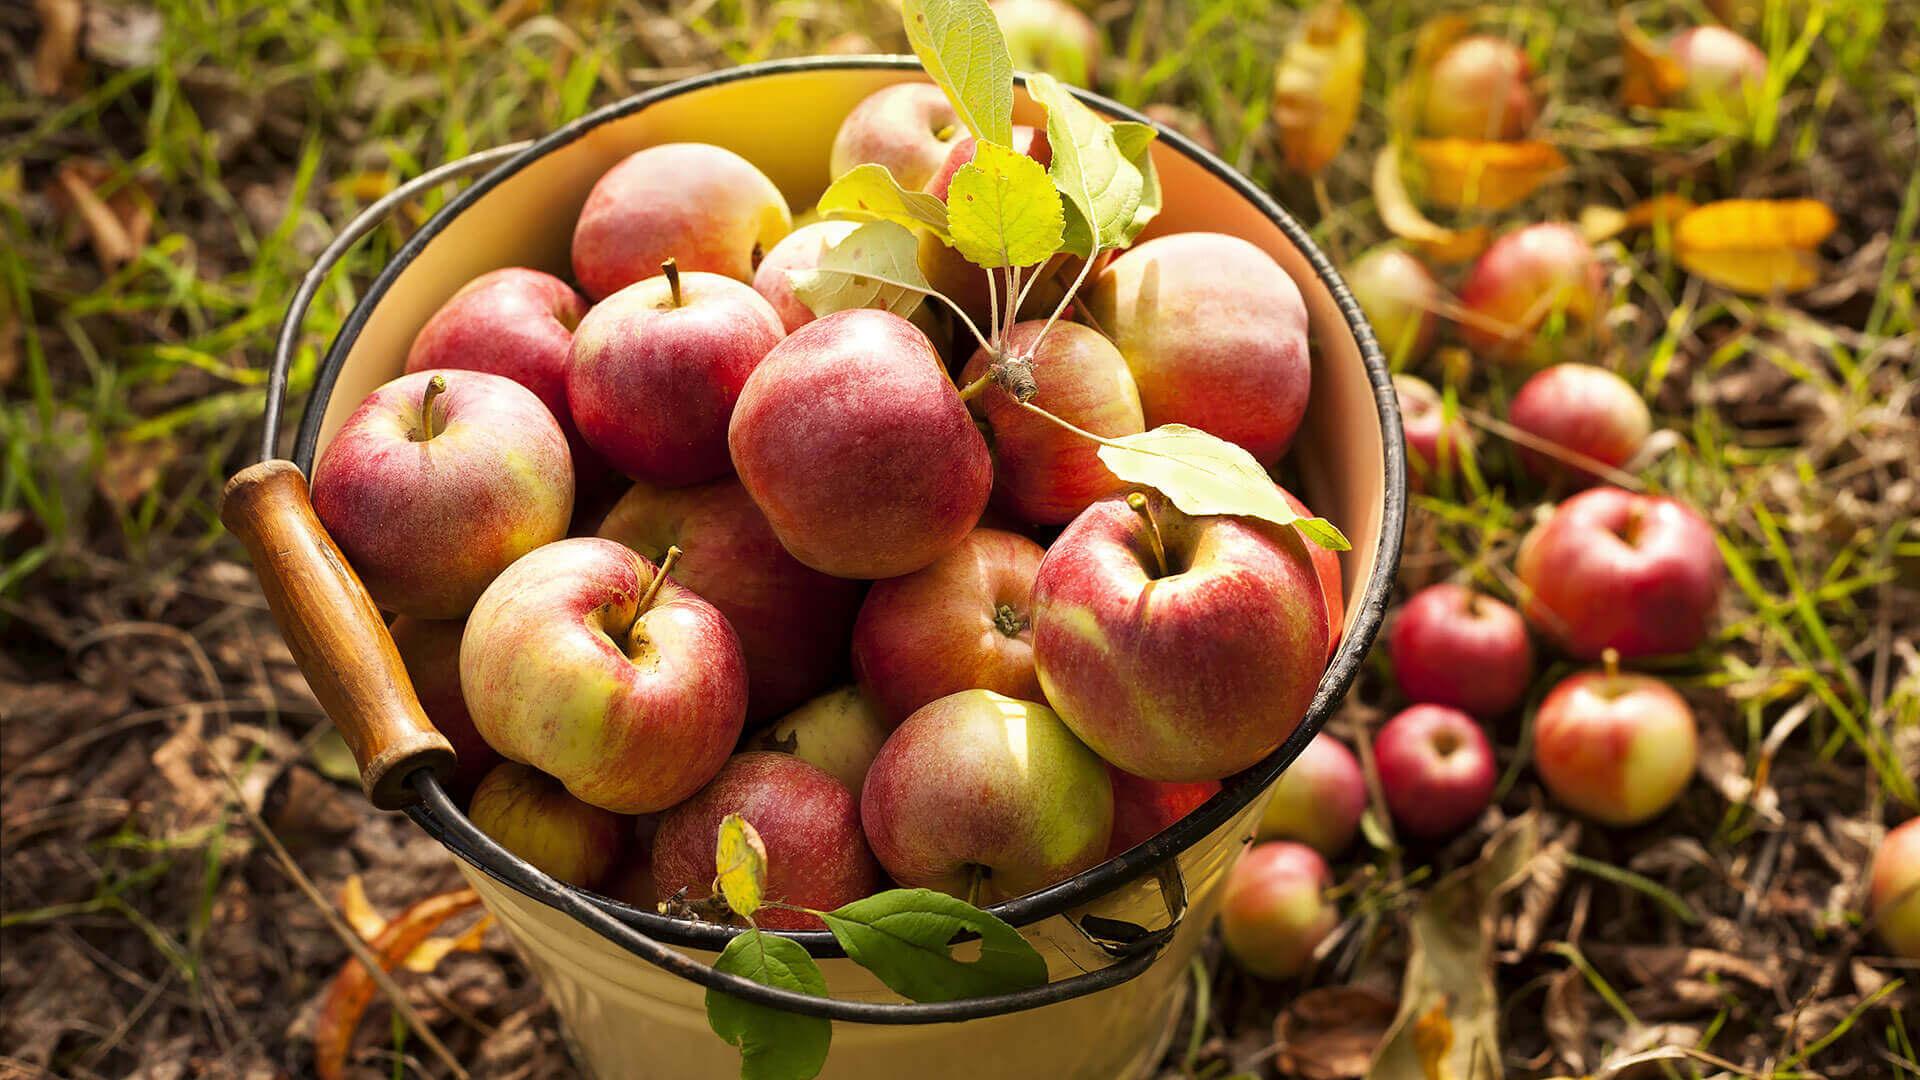 Basket Of Red Apples